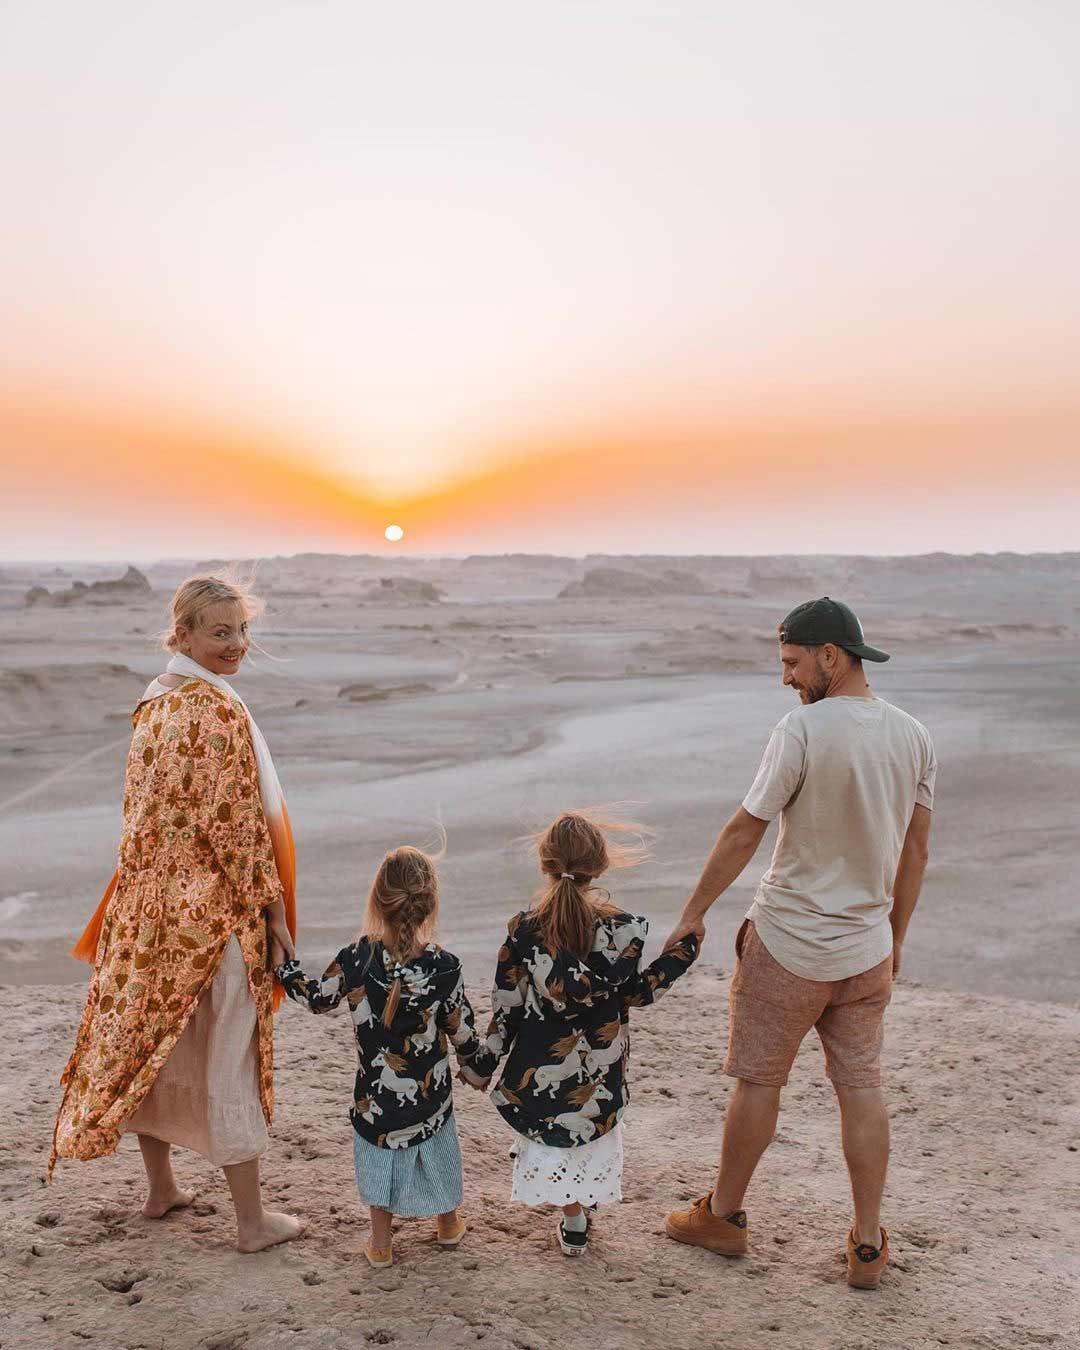 Iran Desert Tour . Inbound Persia Travel Agency